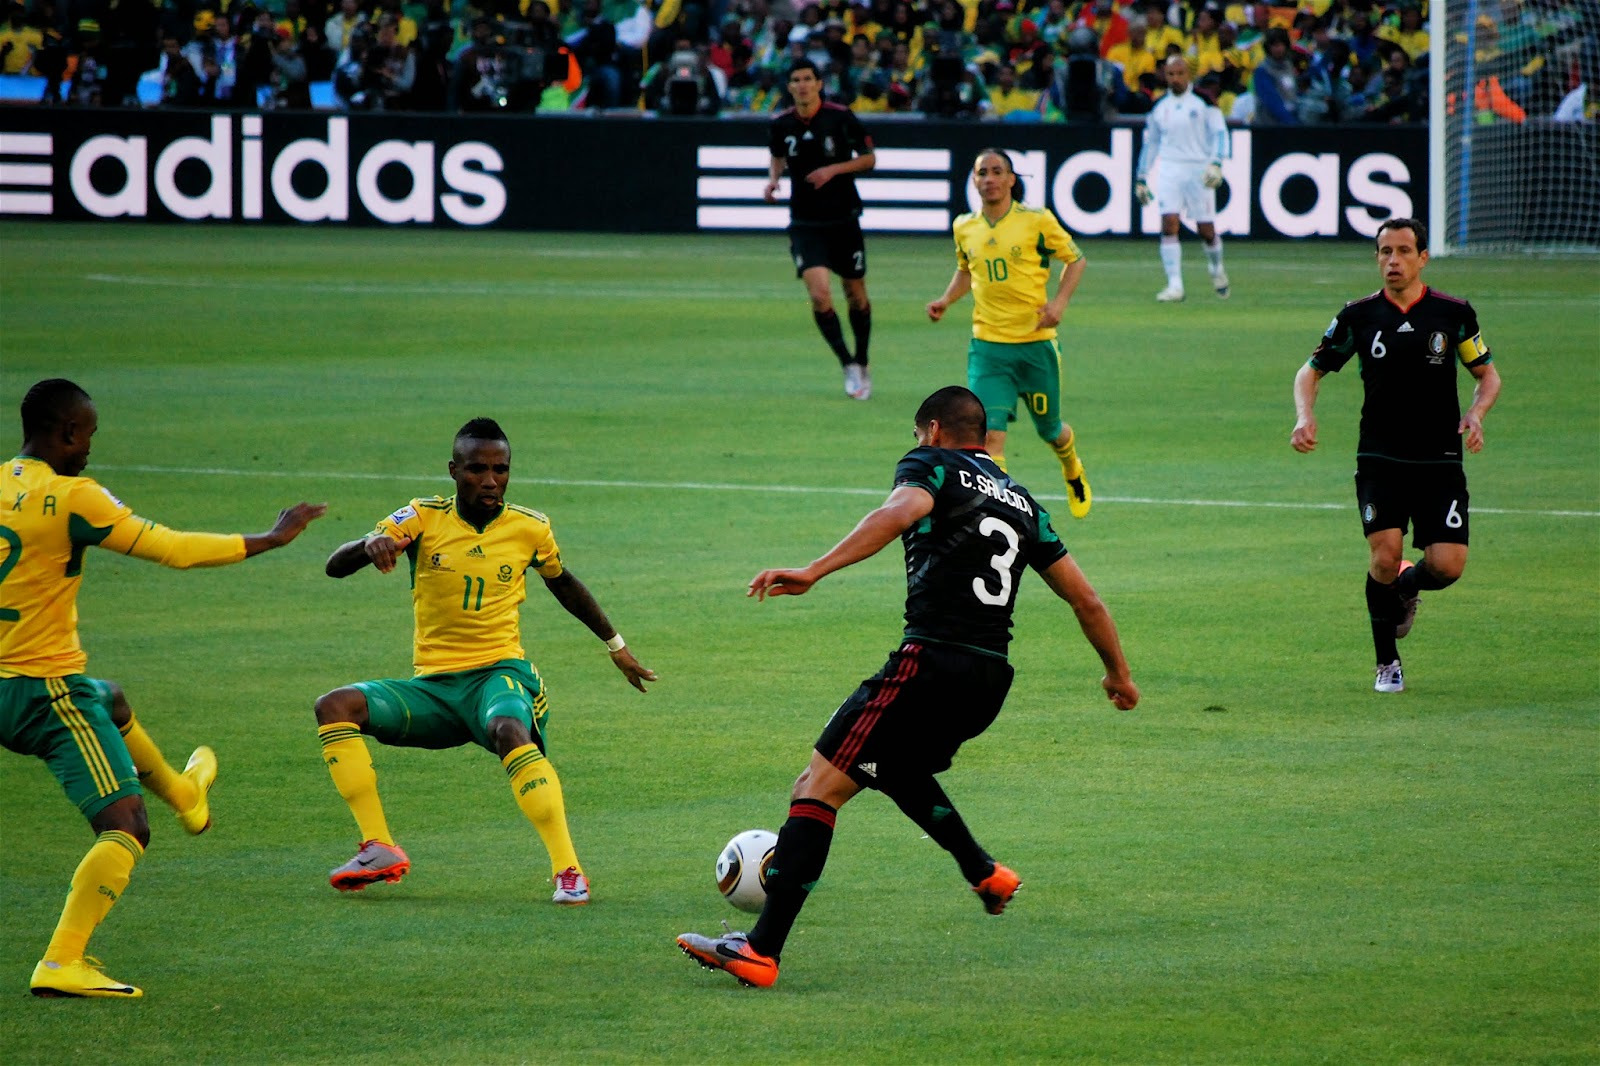 http://www.cbc.ca/sports-content/soccer/brazil2014/